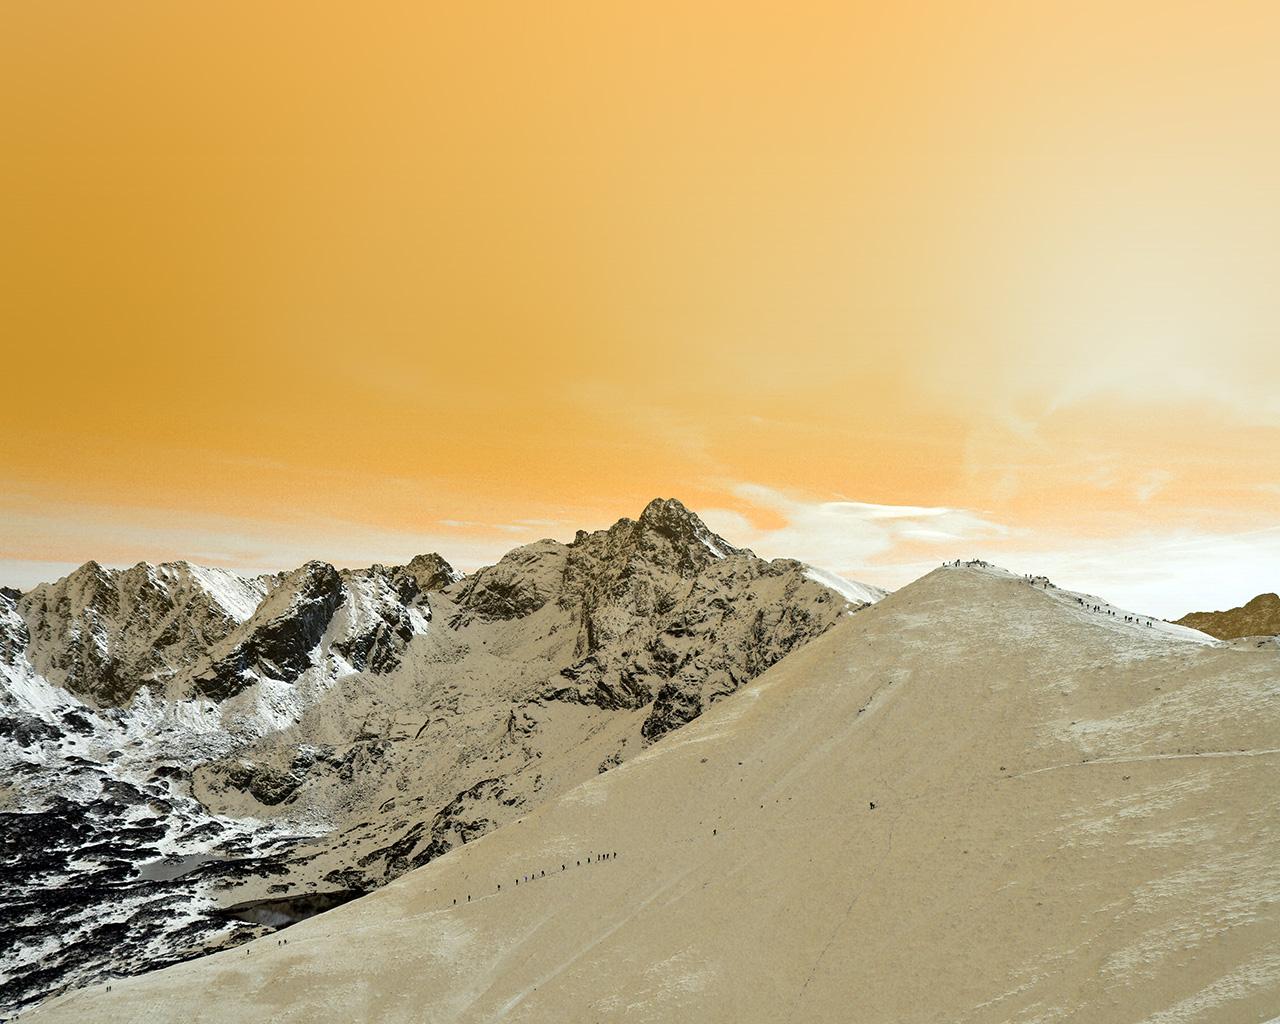 mx97-winter-mountain-snow-gold-nature-orange-wallpaper